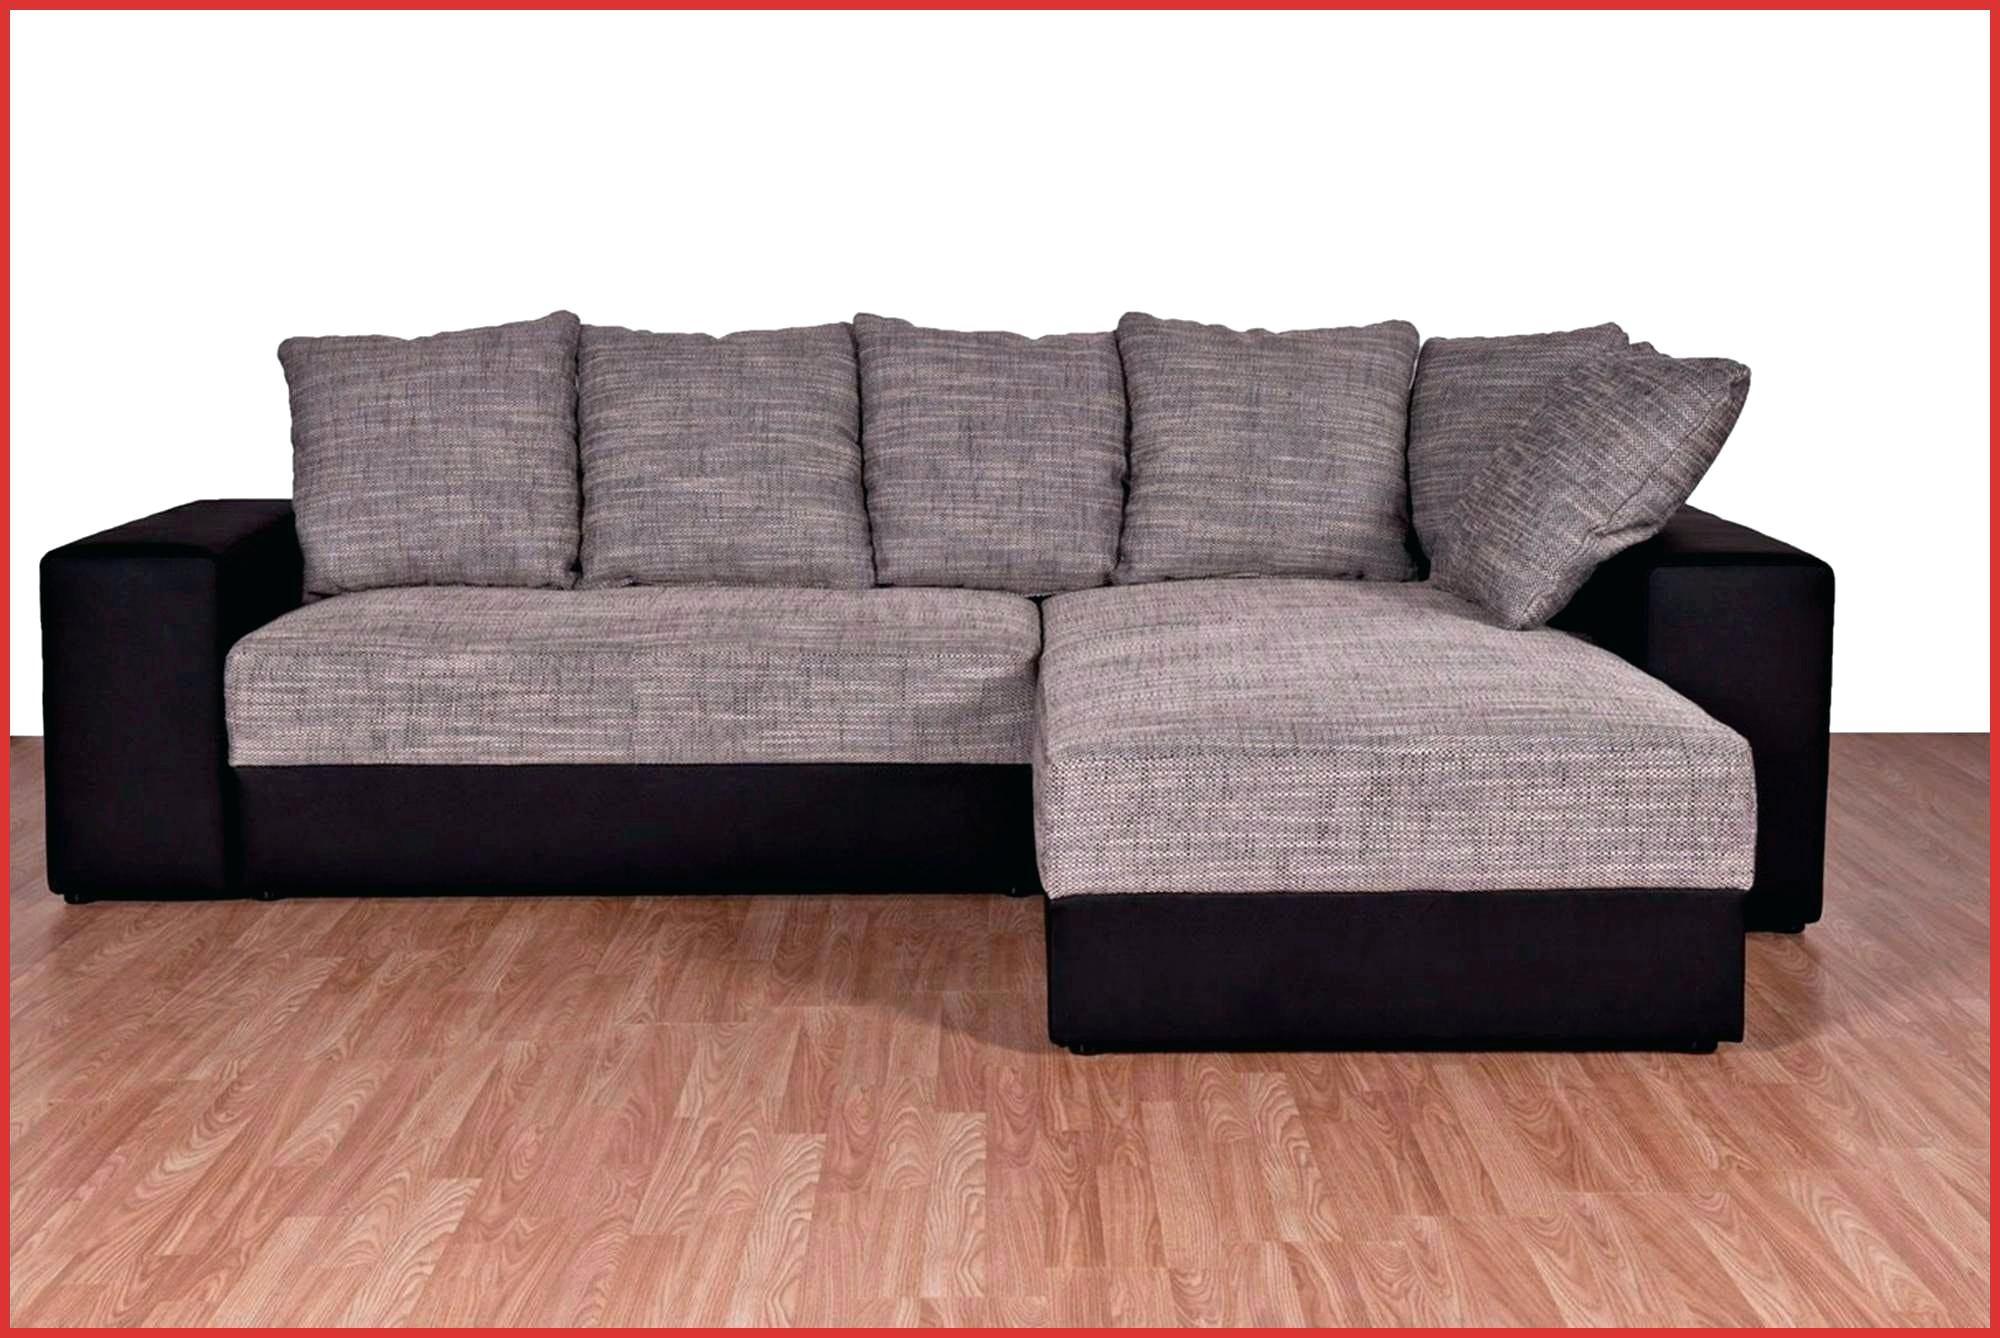 Recouvrir Un Canapé En Cuir Frais Photographie Recouvrir Canapé Tissu Centralillaw